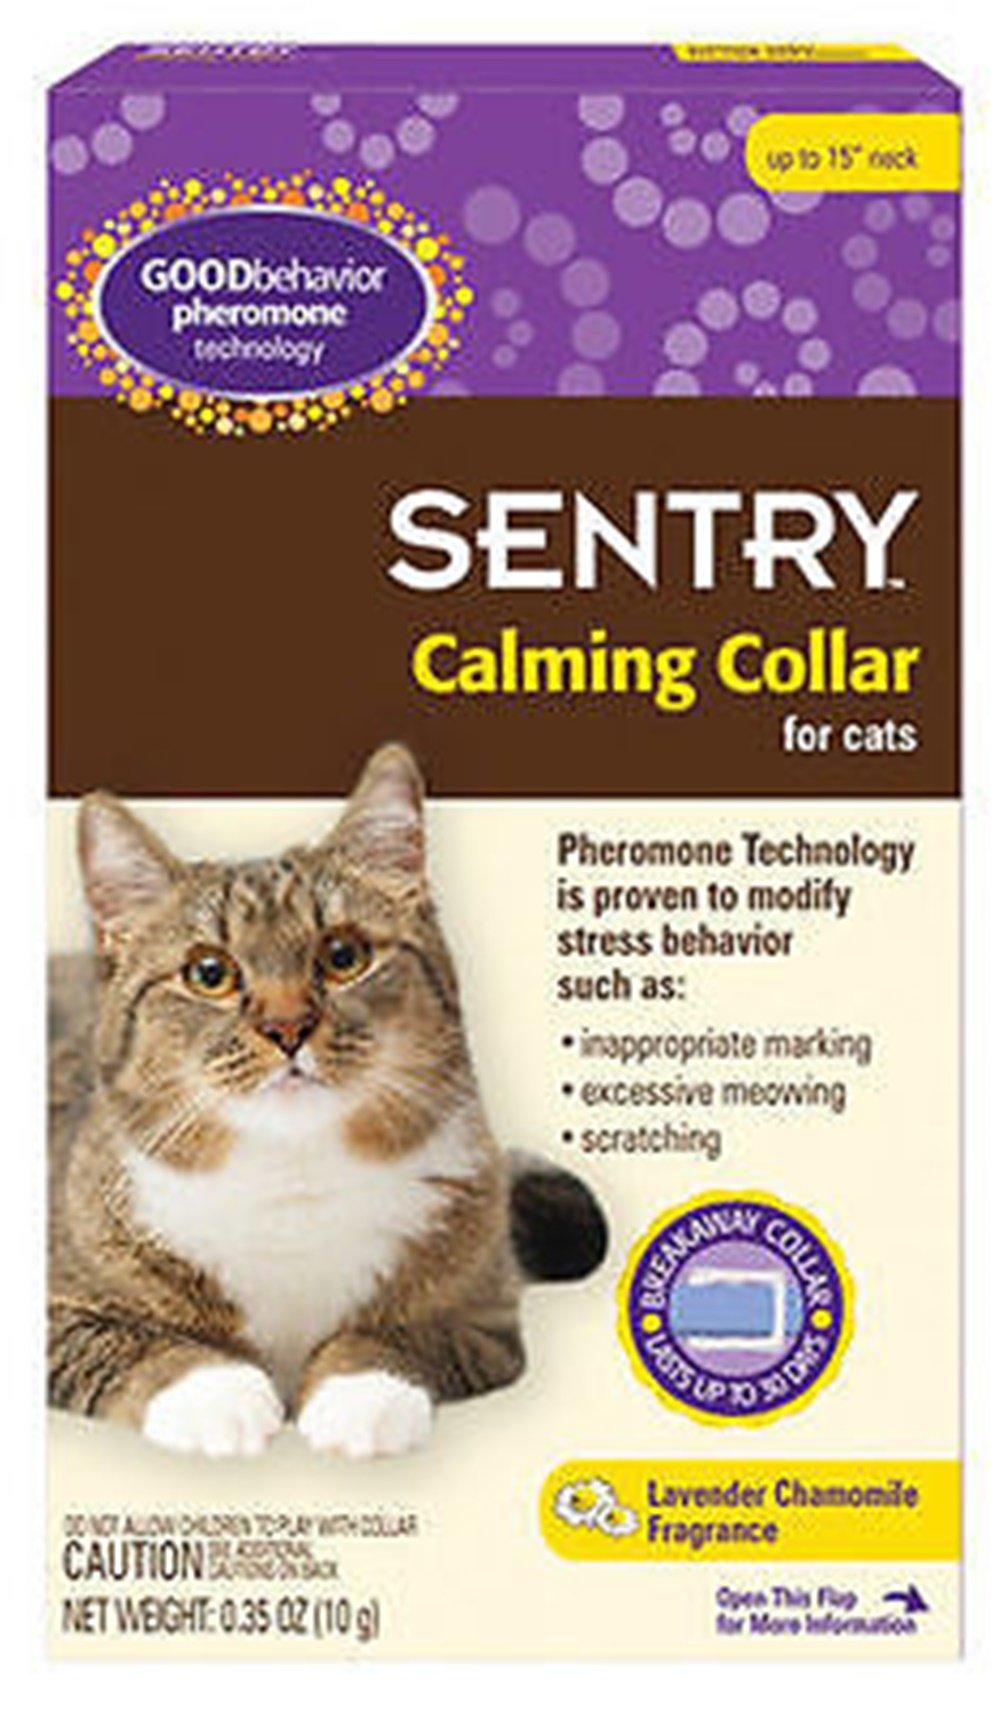 Sentry Good Behavior Pheromone Calming Cat Collar Separation Anxiety Stress